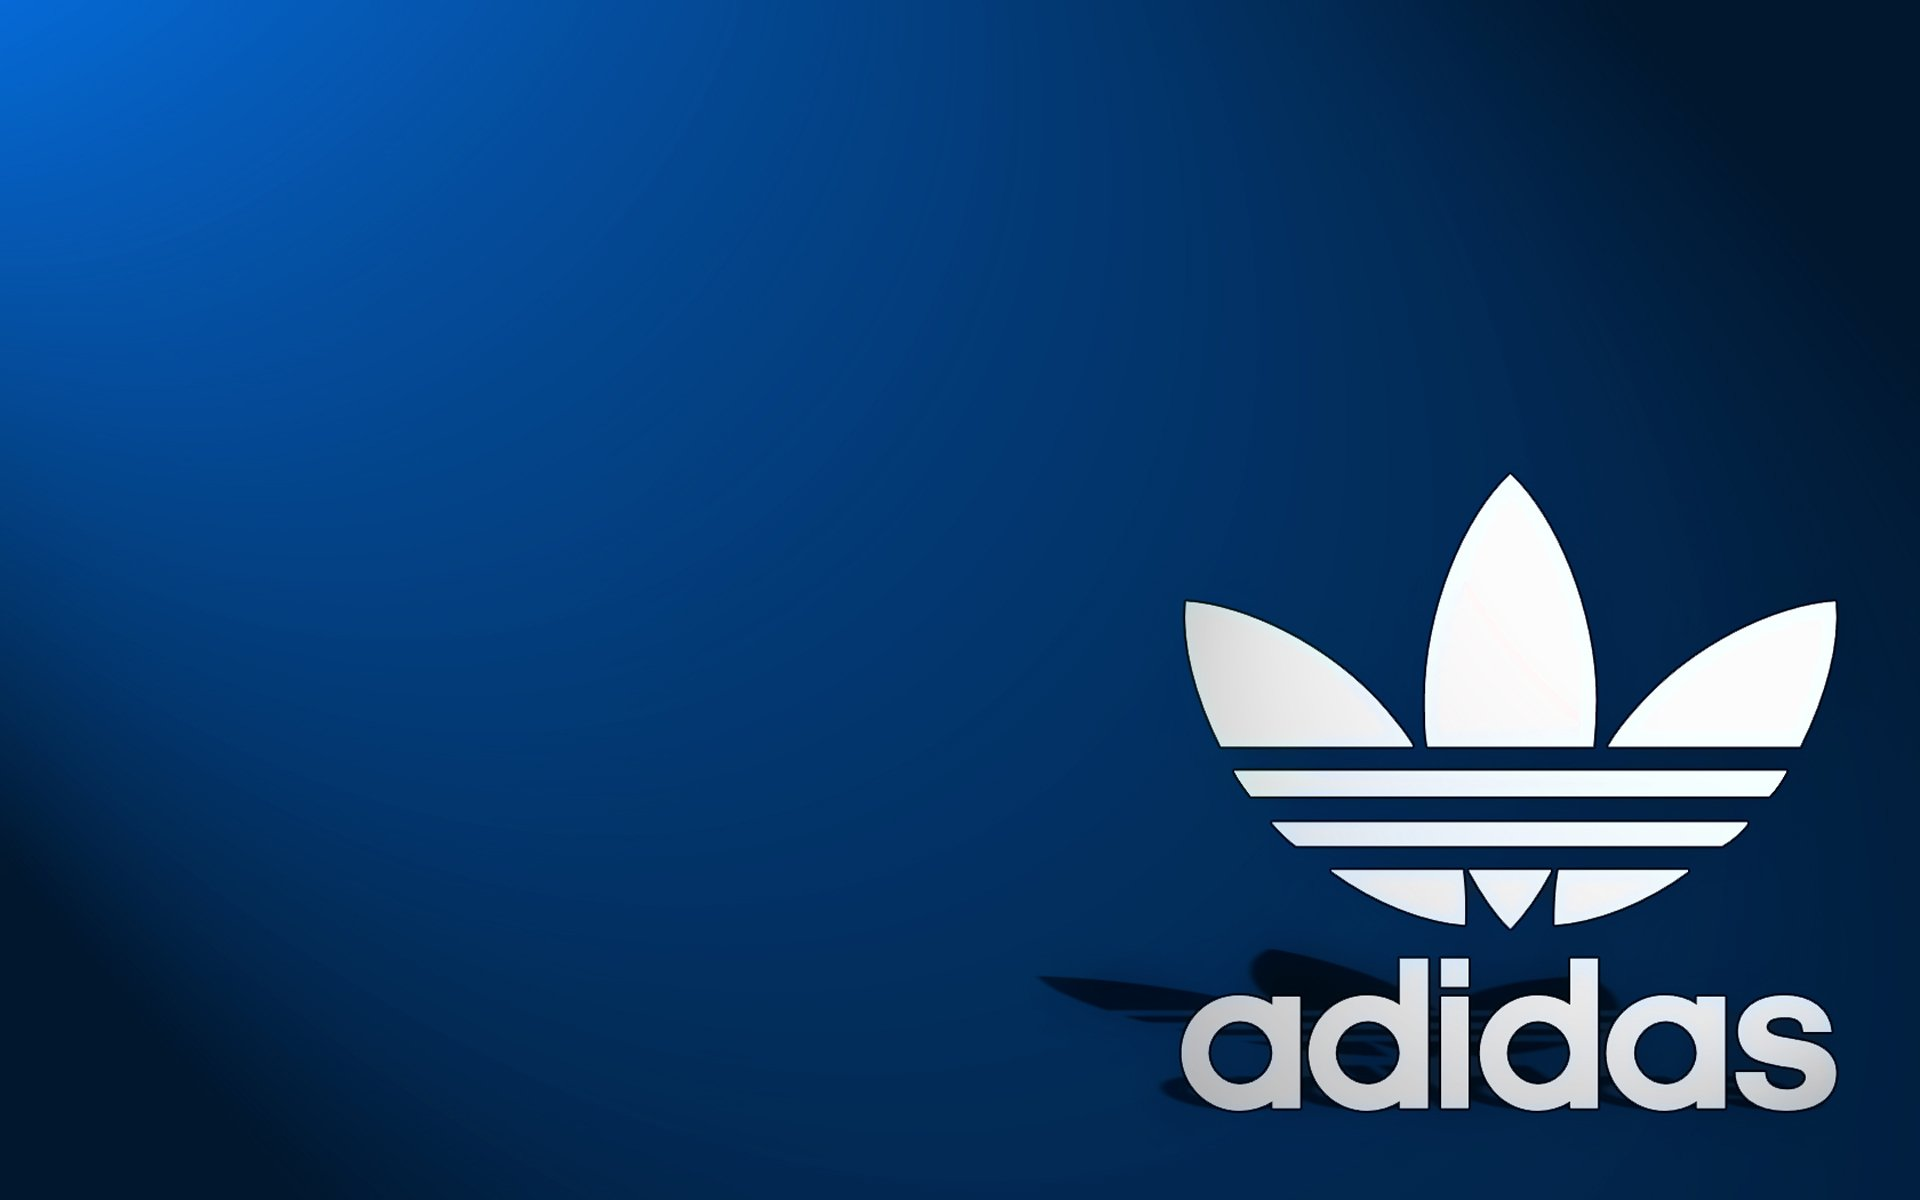 adidas iphone wallpaper, adidas wallpaper iphone 6